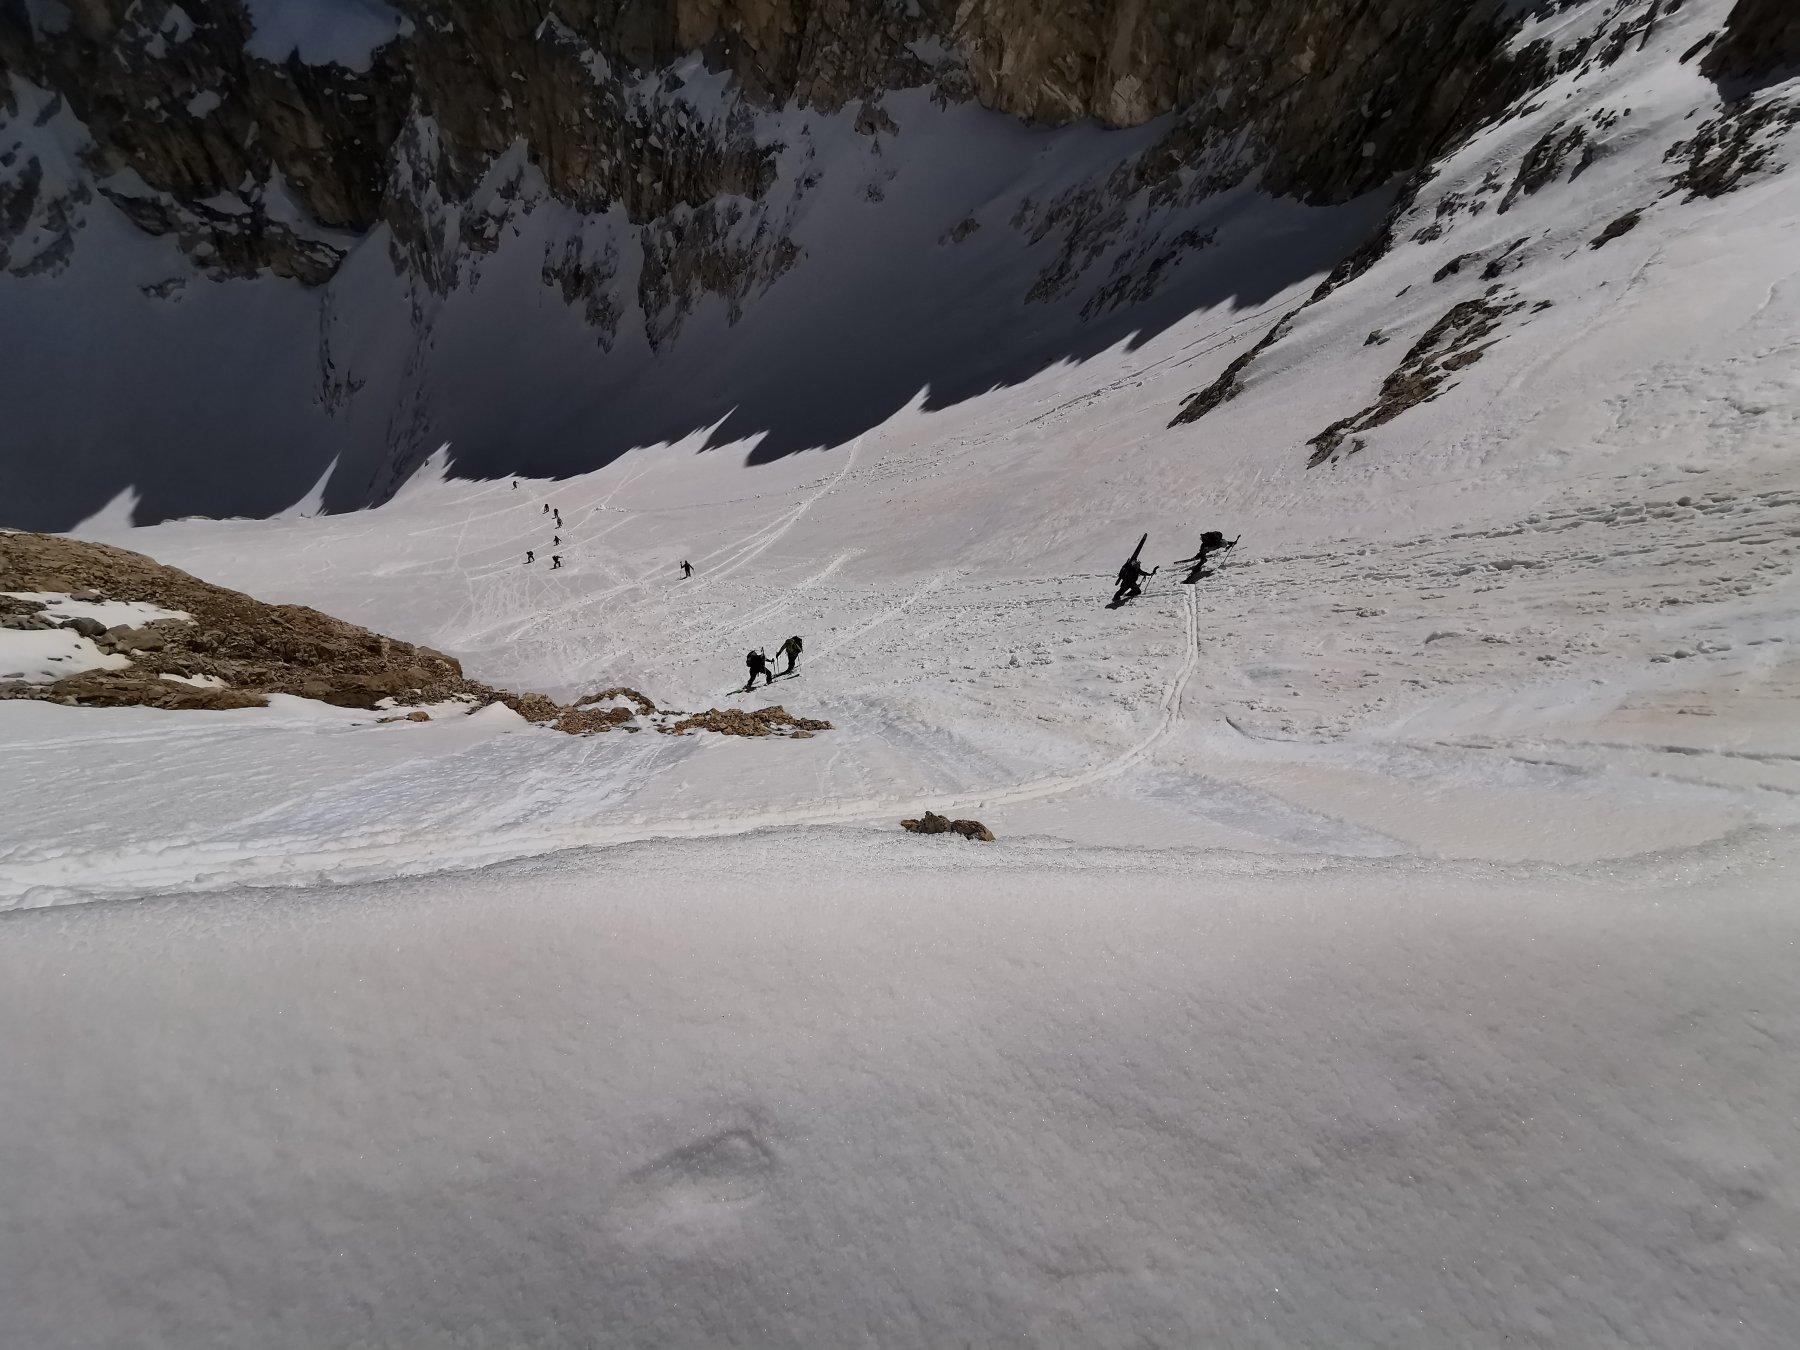 Salita al ghiacciaio del Calderone